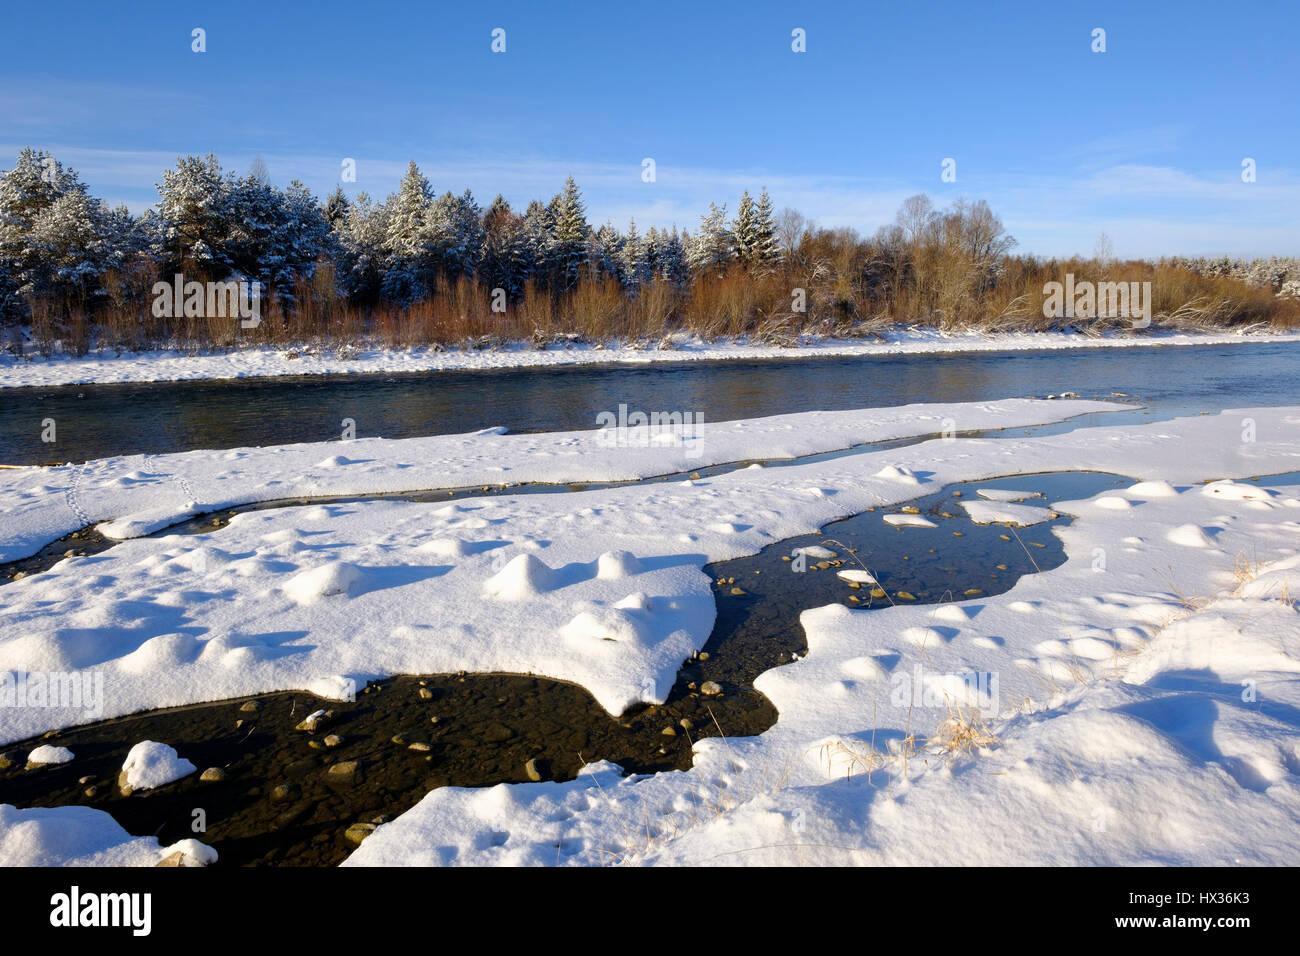 Isar in winter, snow on gravel bank, natural reserve Isarauen, Pupplinger Au, Upper Bavaria, Bavaria Germany Stock Photo